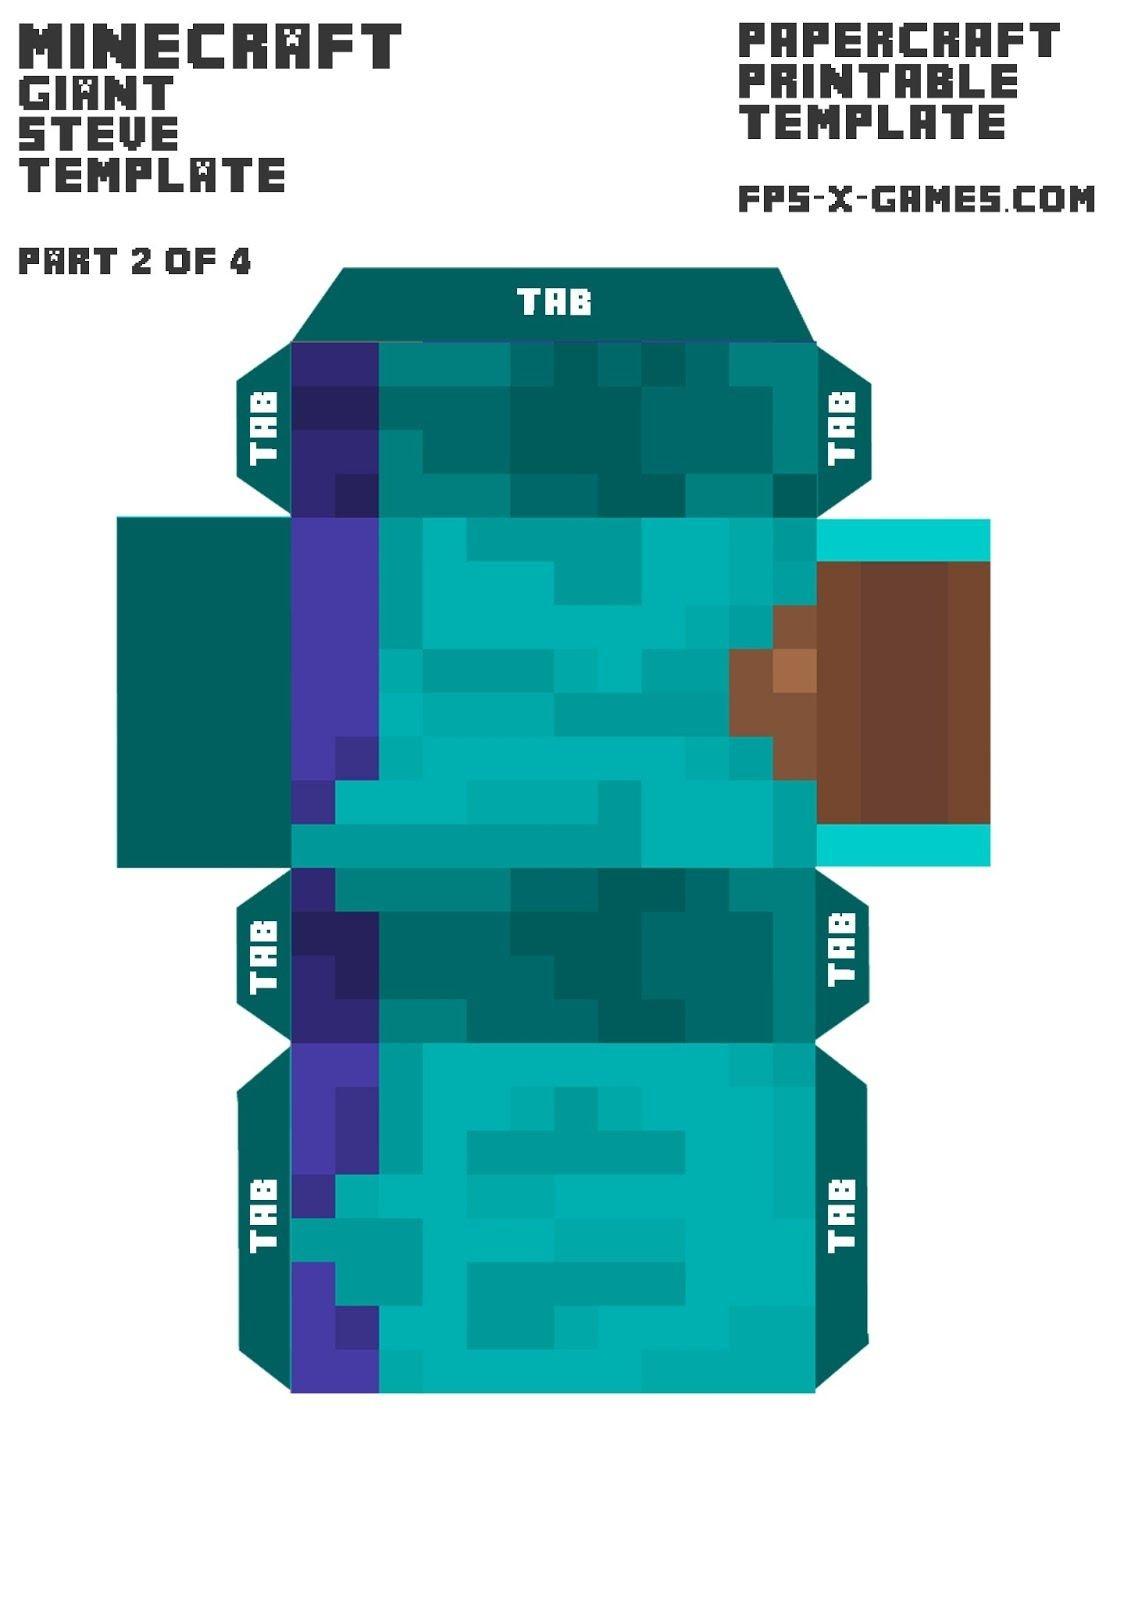 Papercraft Minecraft Steve Minecraft Giant Steve Arms Template 3 4